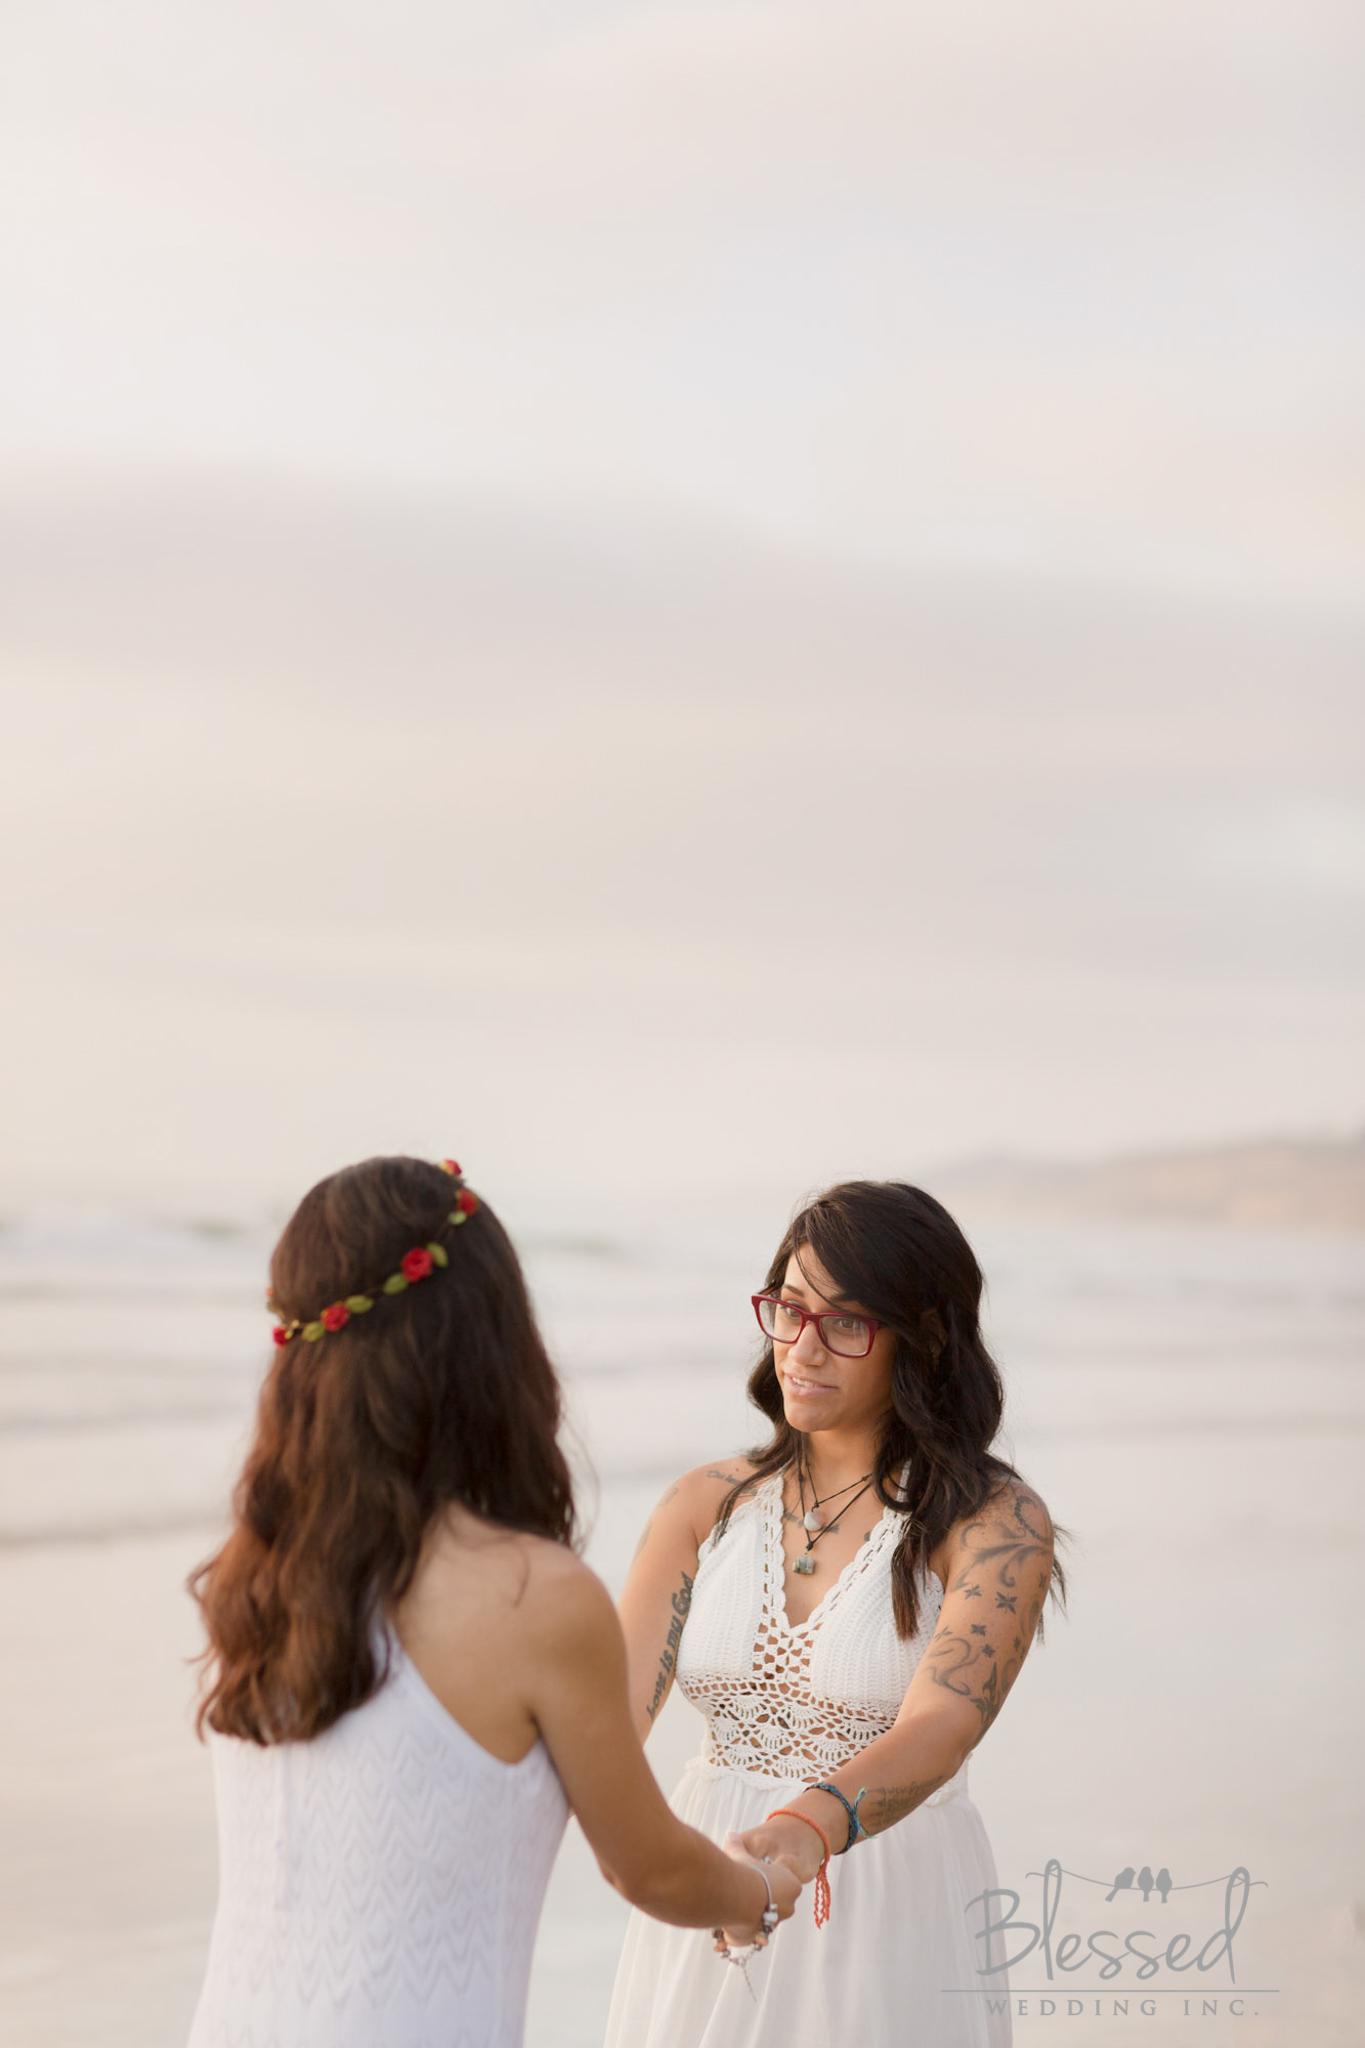 La Jolla Beach Engagement Session by San Diego Wedding Photographers Blessed Wedding-39.jpg